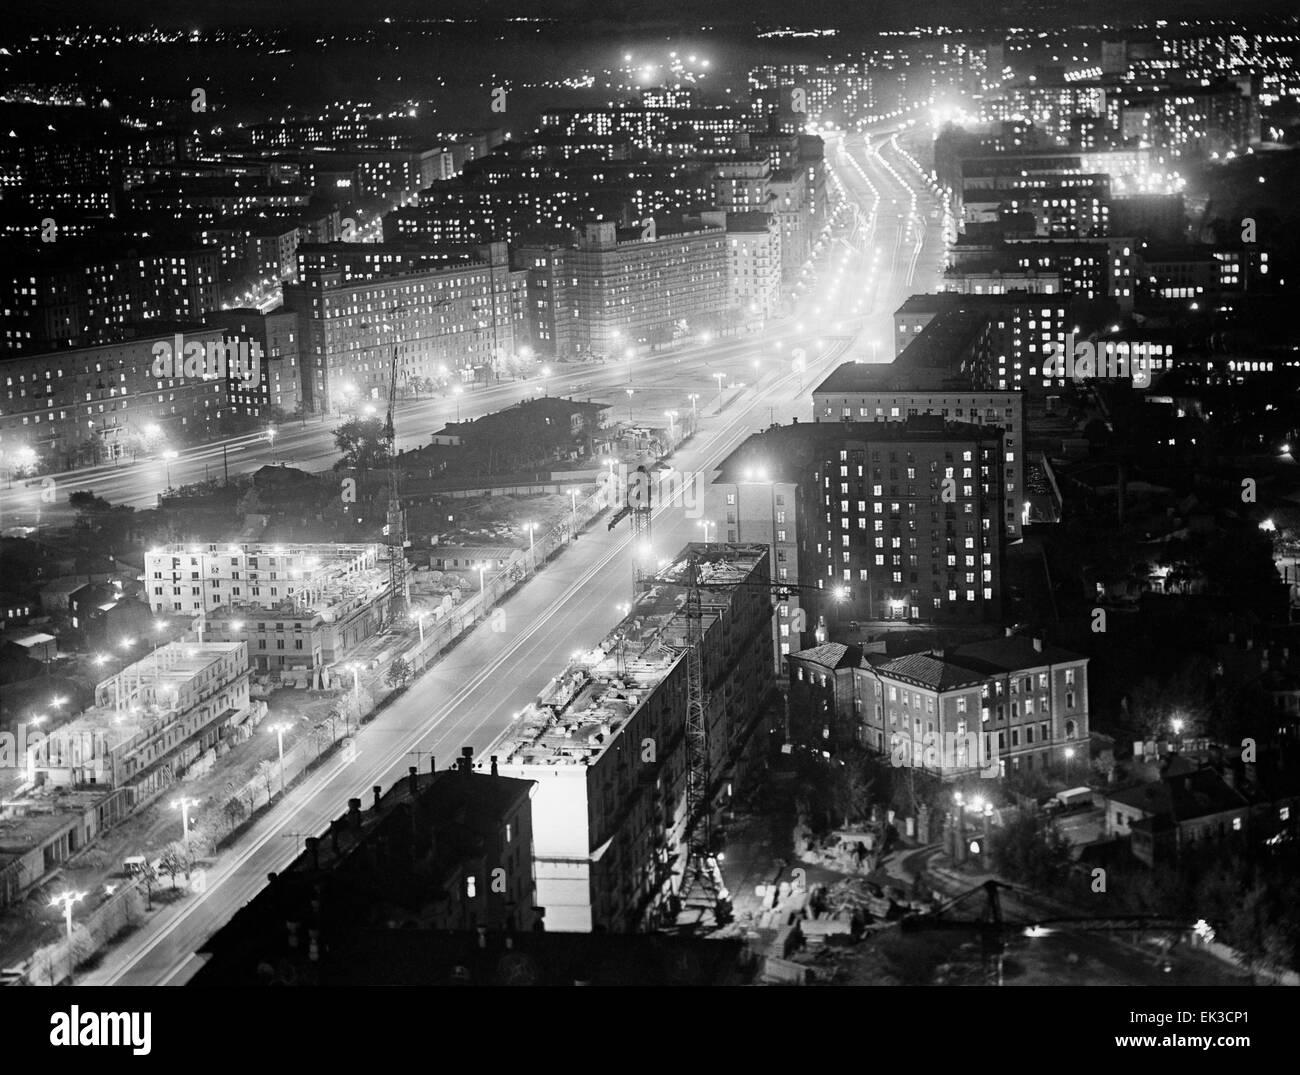 Moscow's Kutuzovsky Prospekt in the evening. - Stock Image